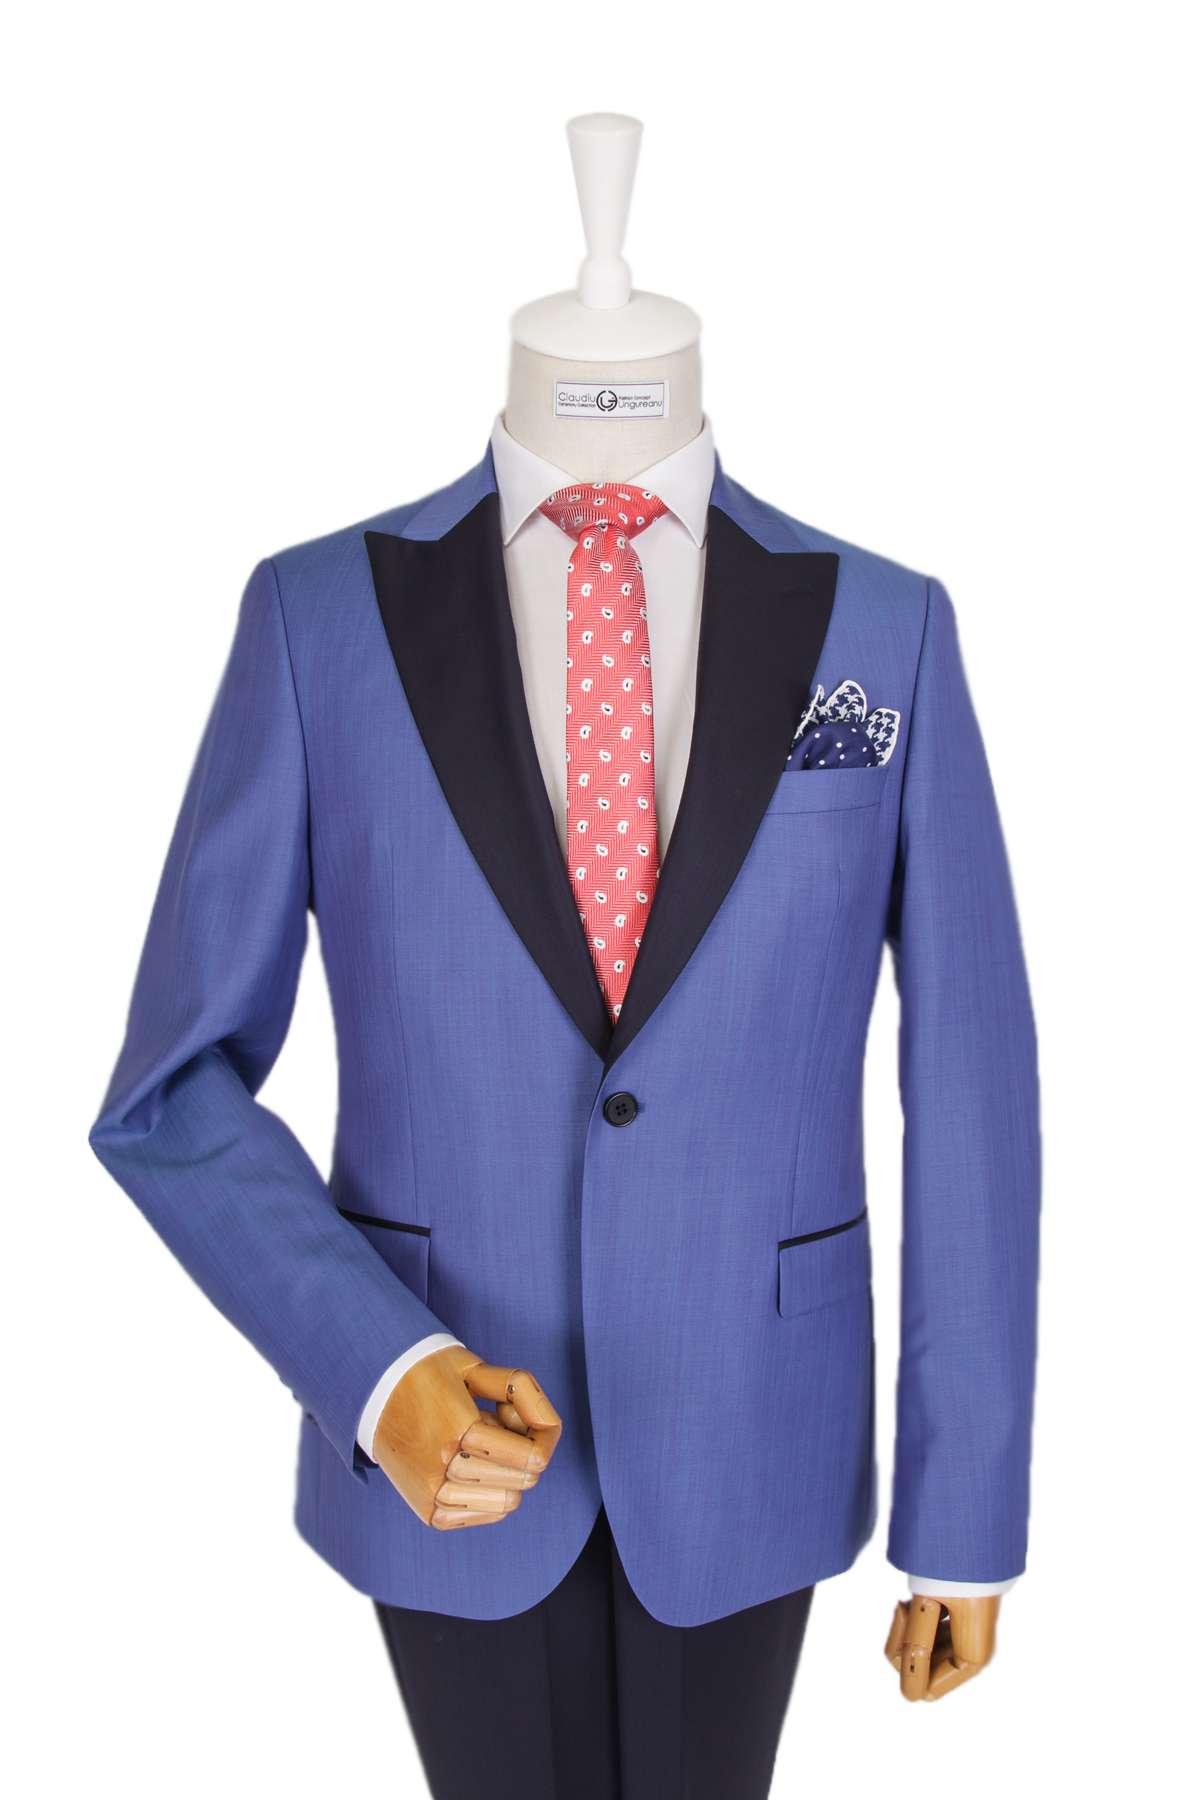 Ceremony Bespoke Blue Dinner Jacket